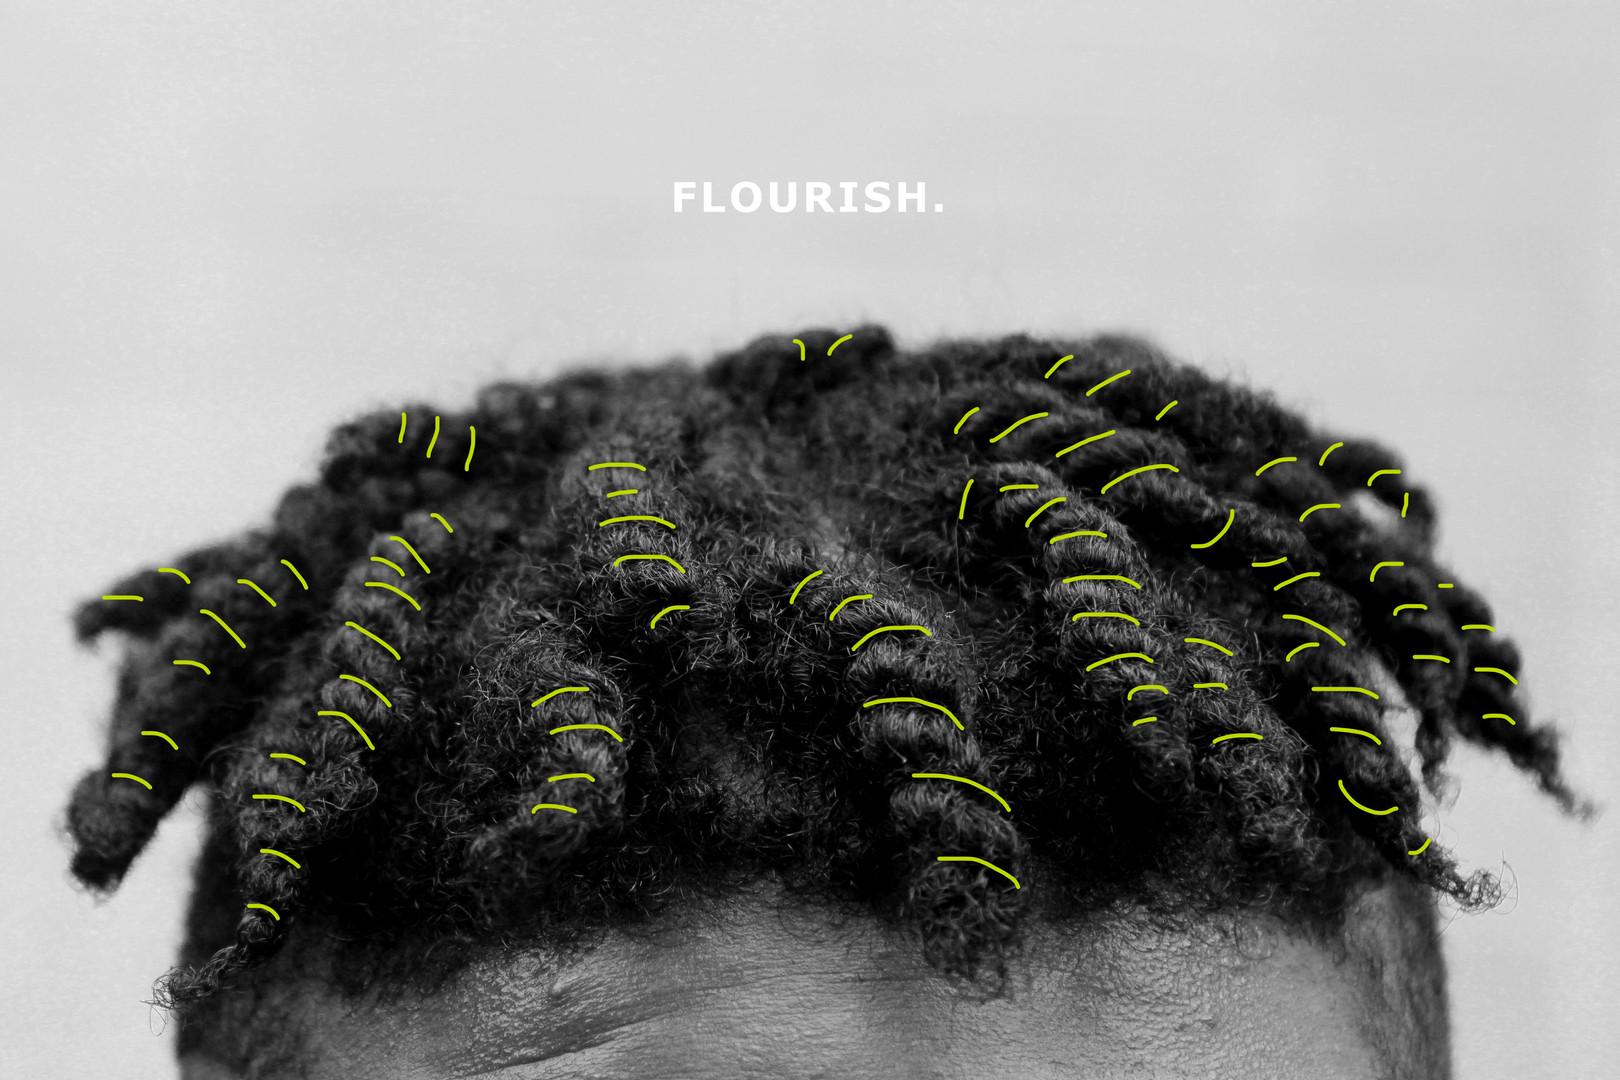 FLOURISHbwg.jpg